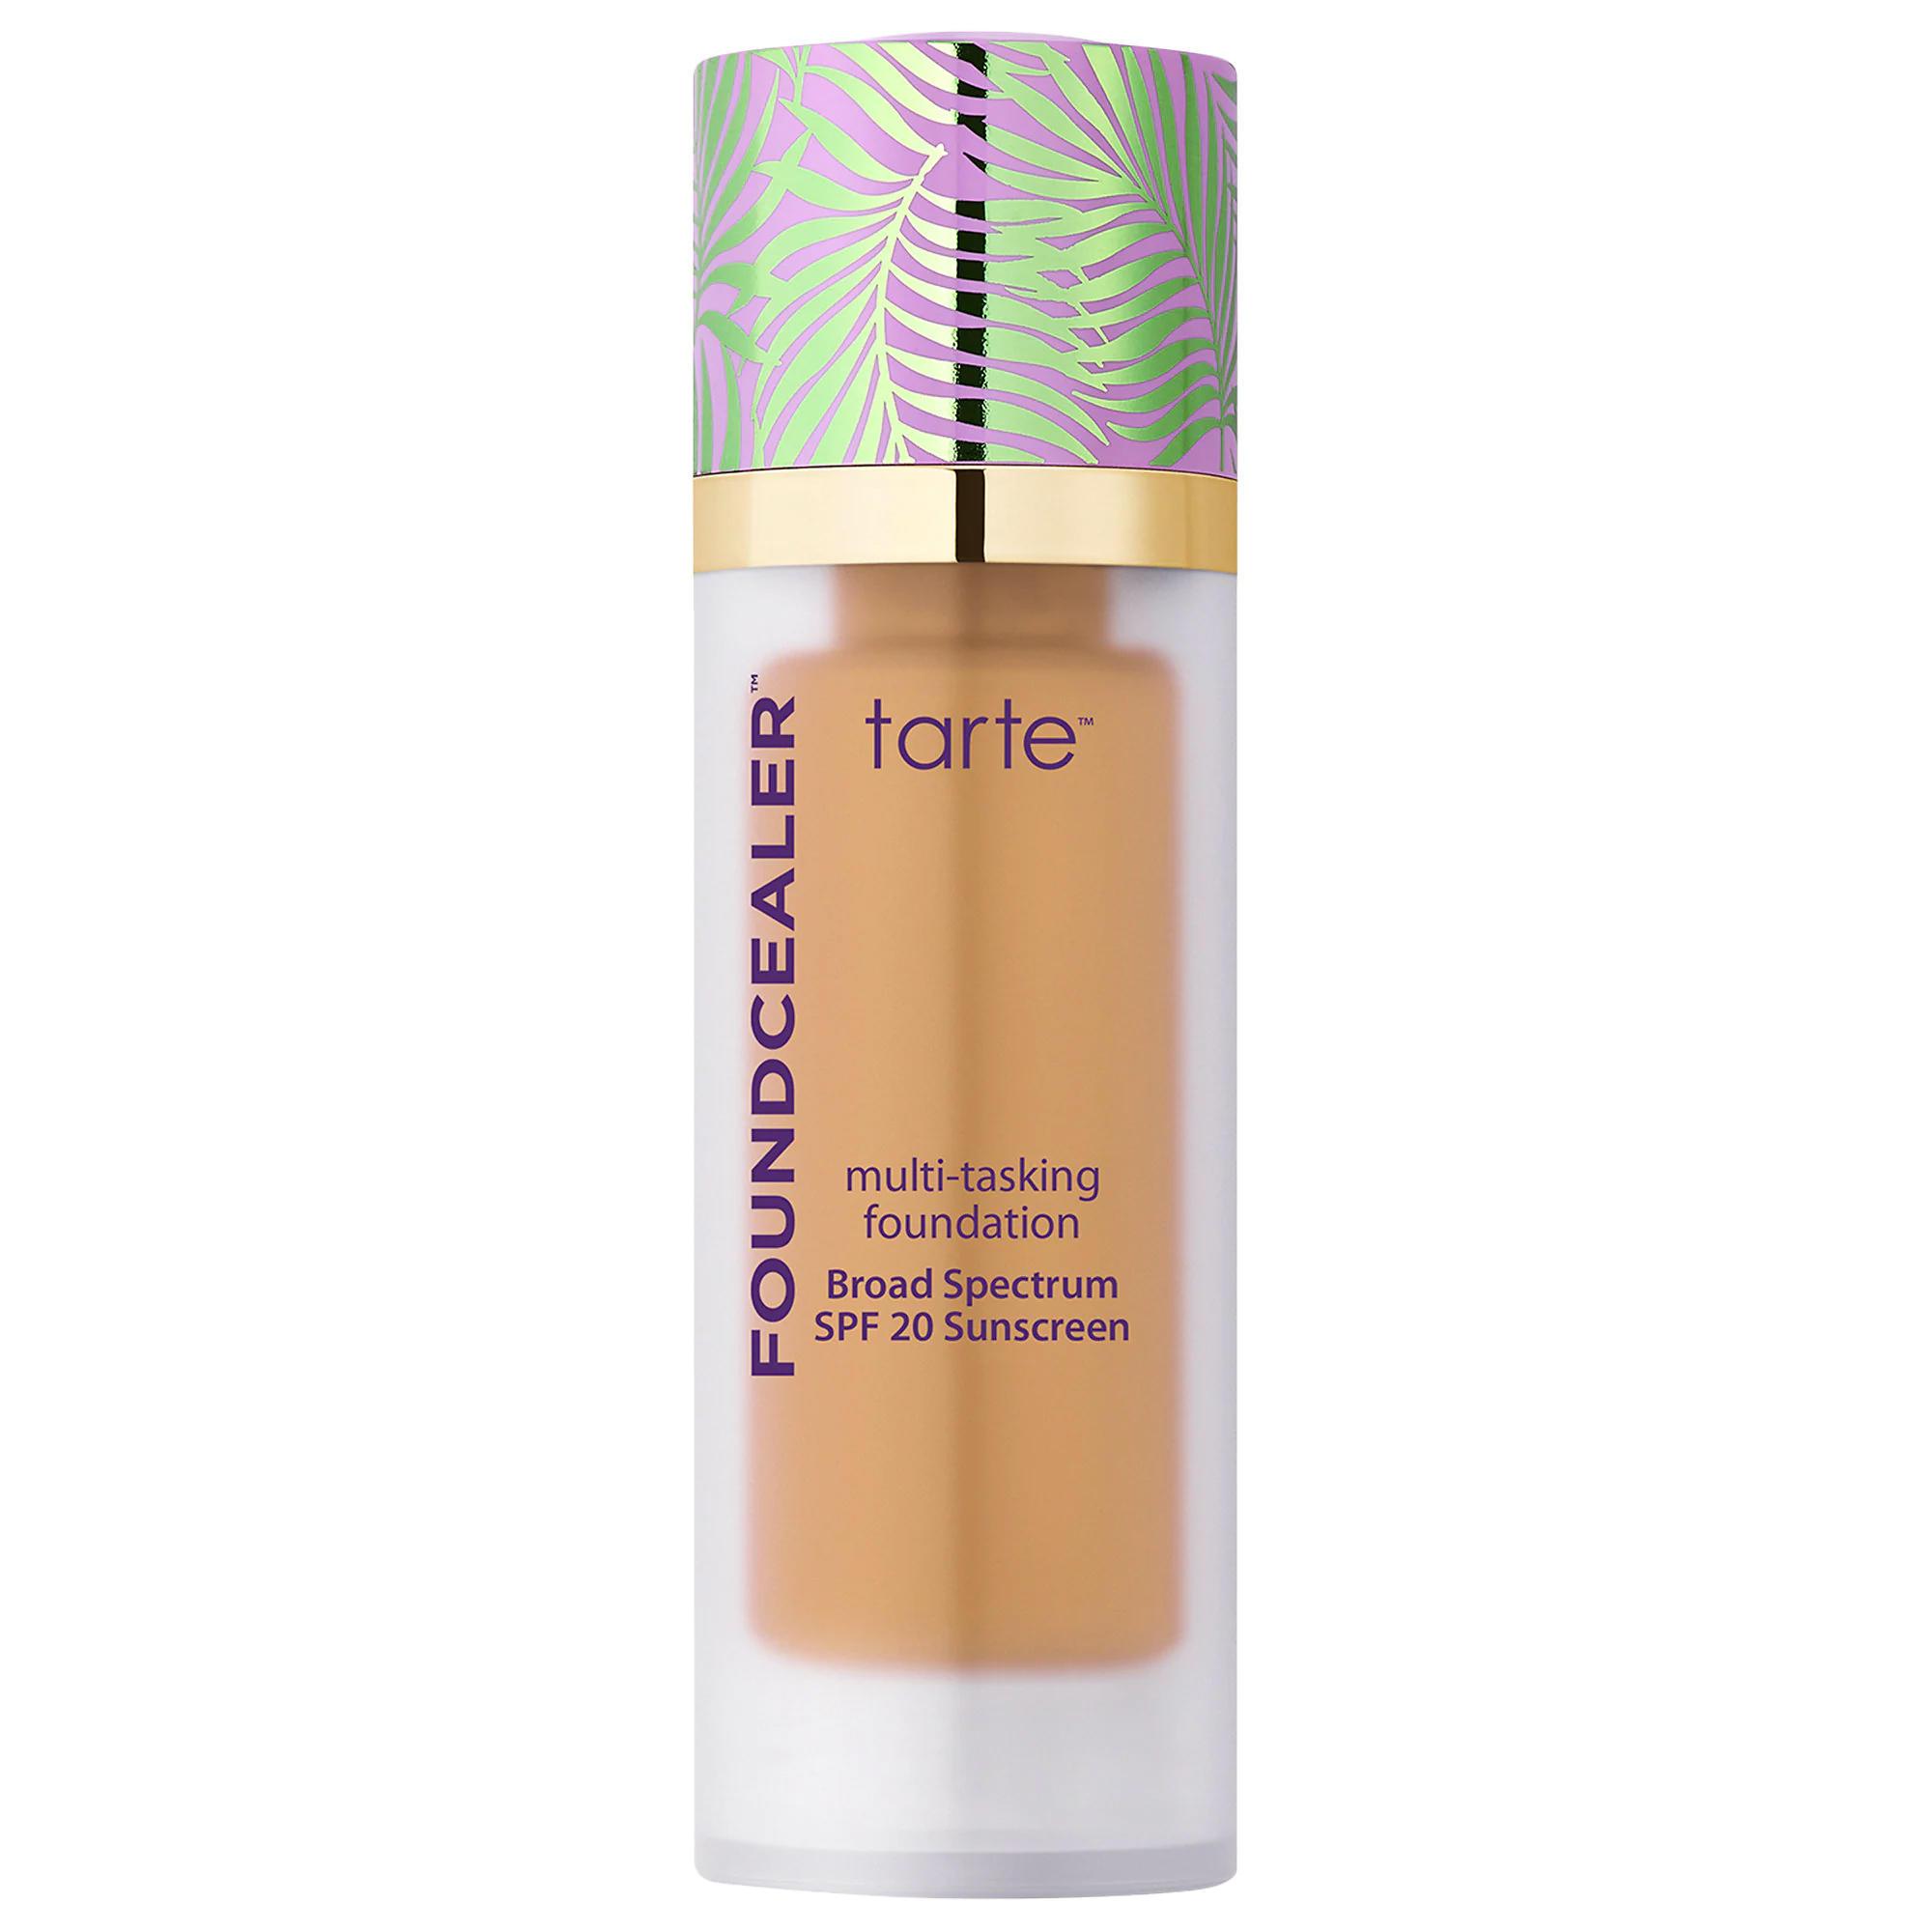 Tarte Foundcealer Multi-Tasking Foundation Tan-Deep Sand 48S